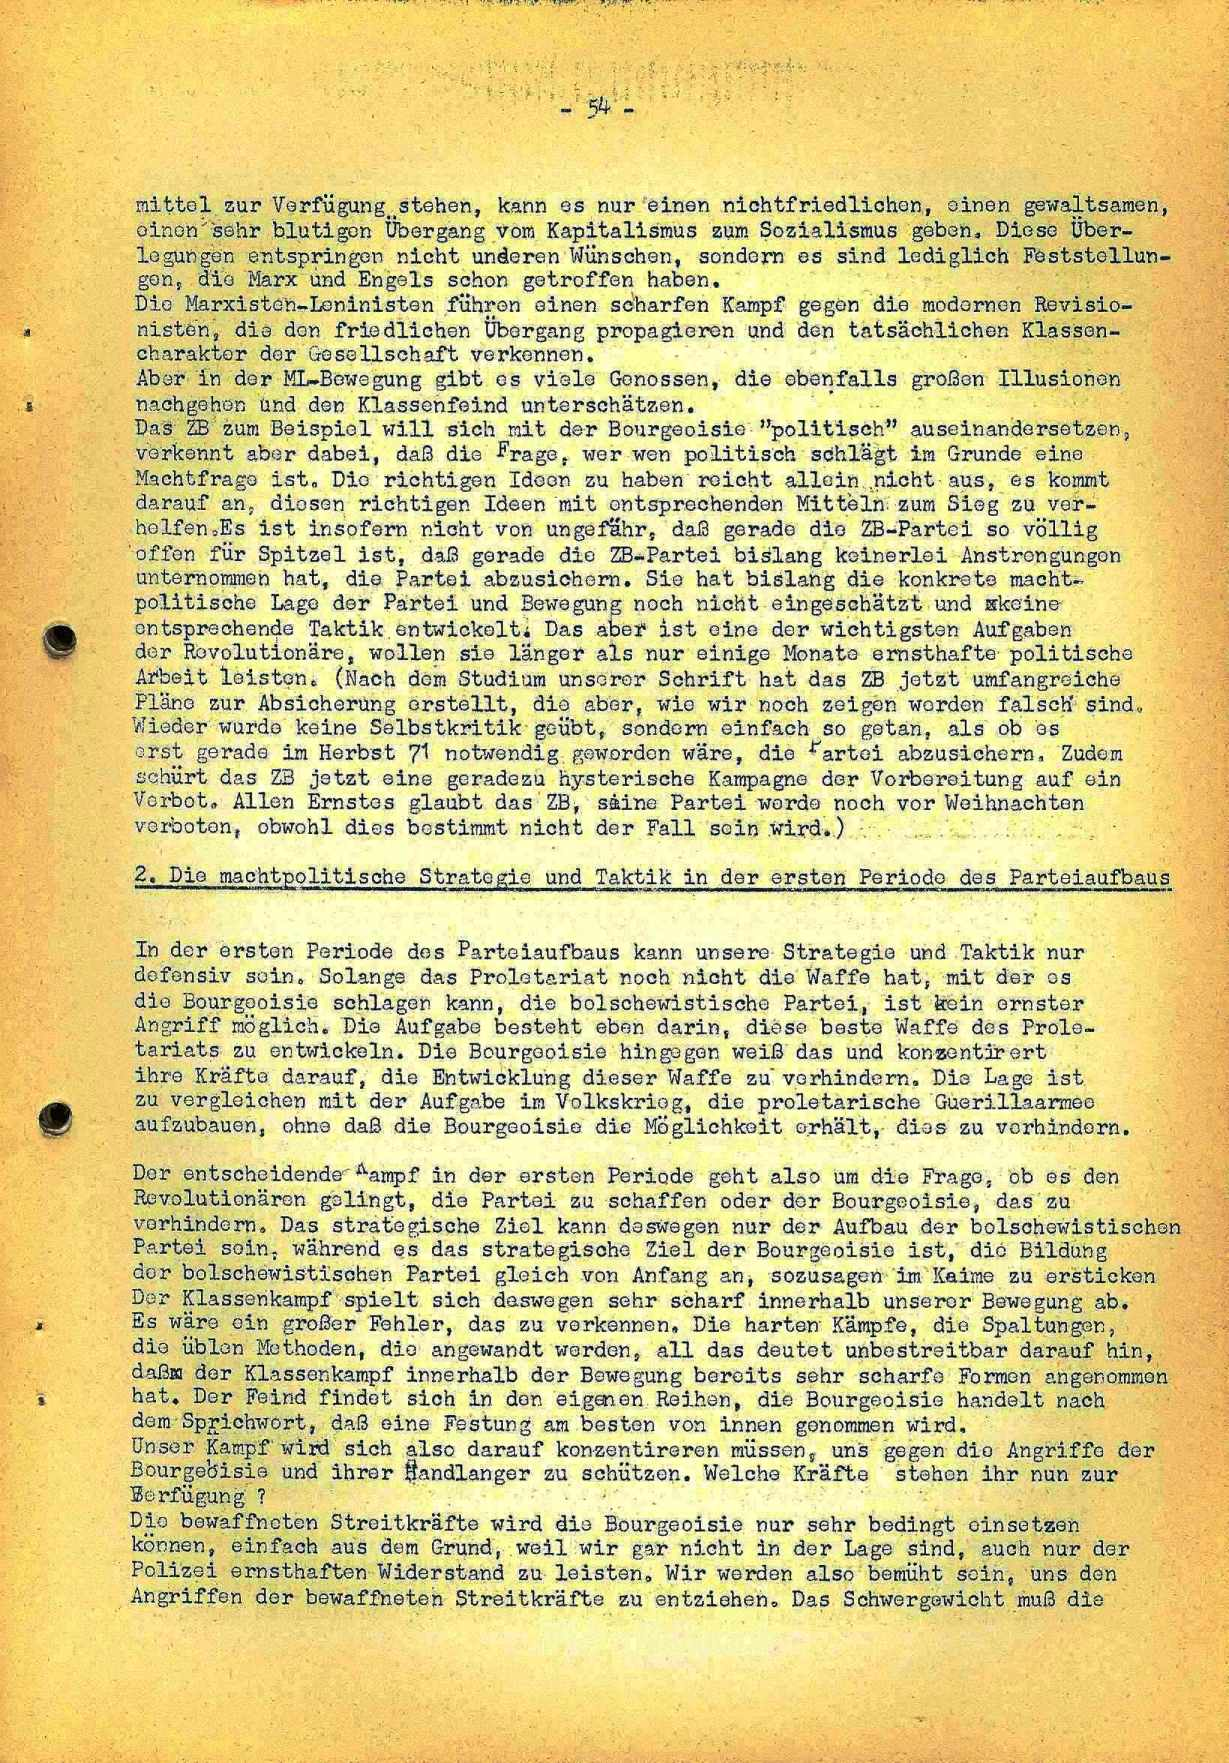 Weinfurth054